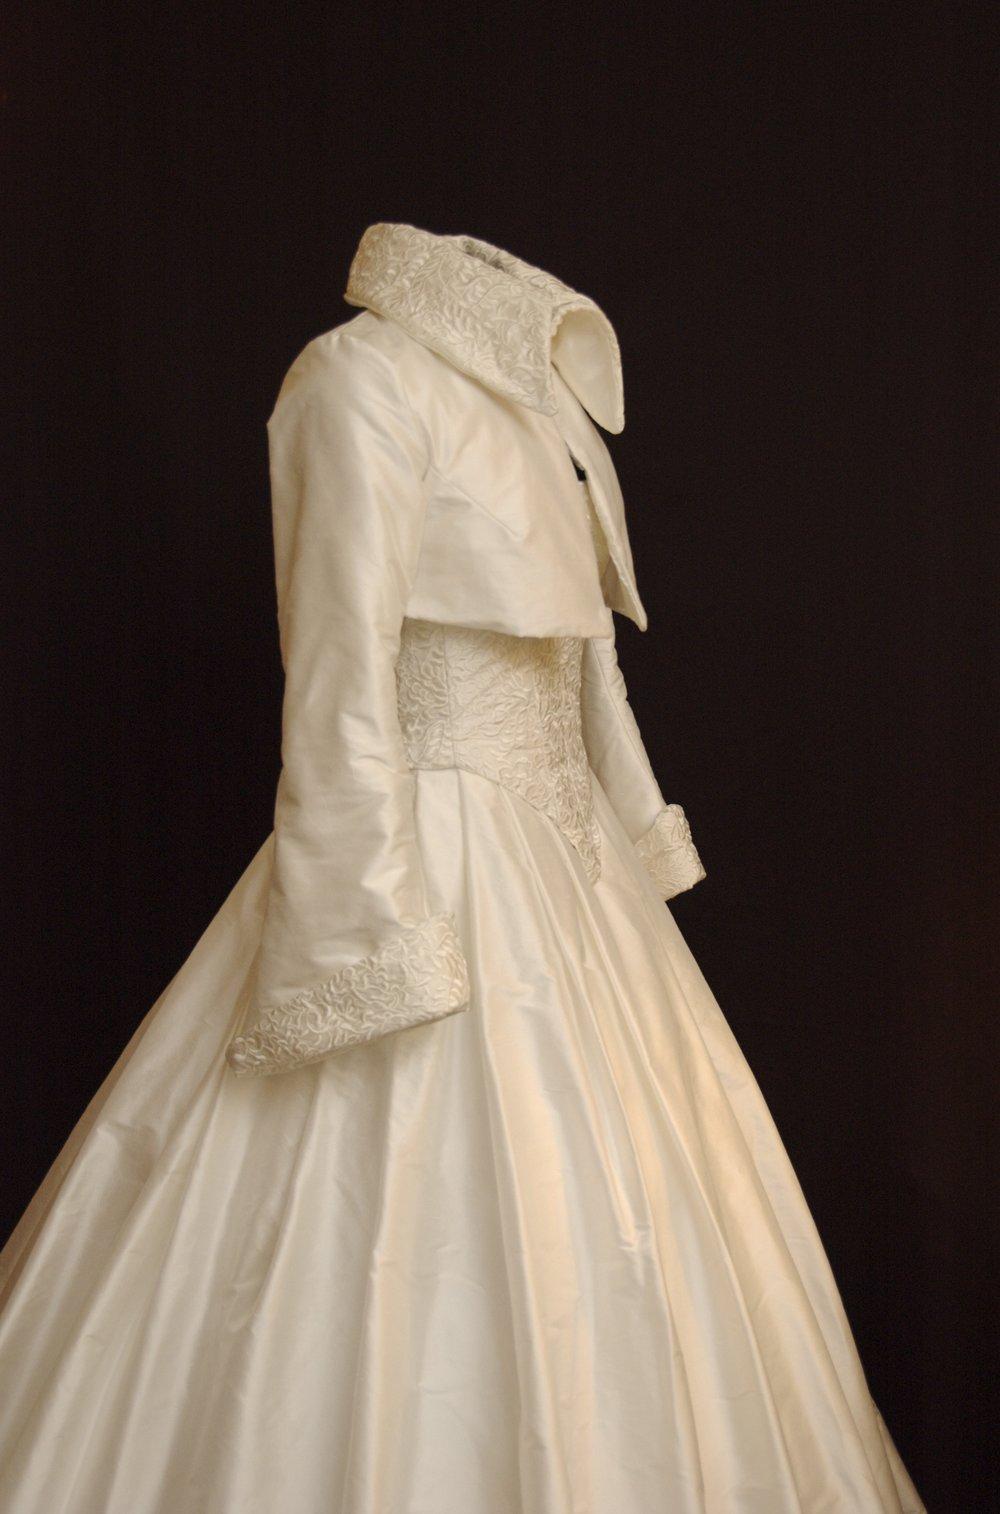 Robe de mariée boléro soie brodée laine polaire Agnes Szabelewski.jpg